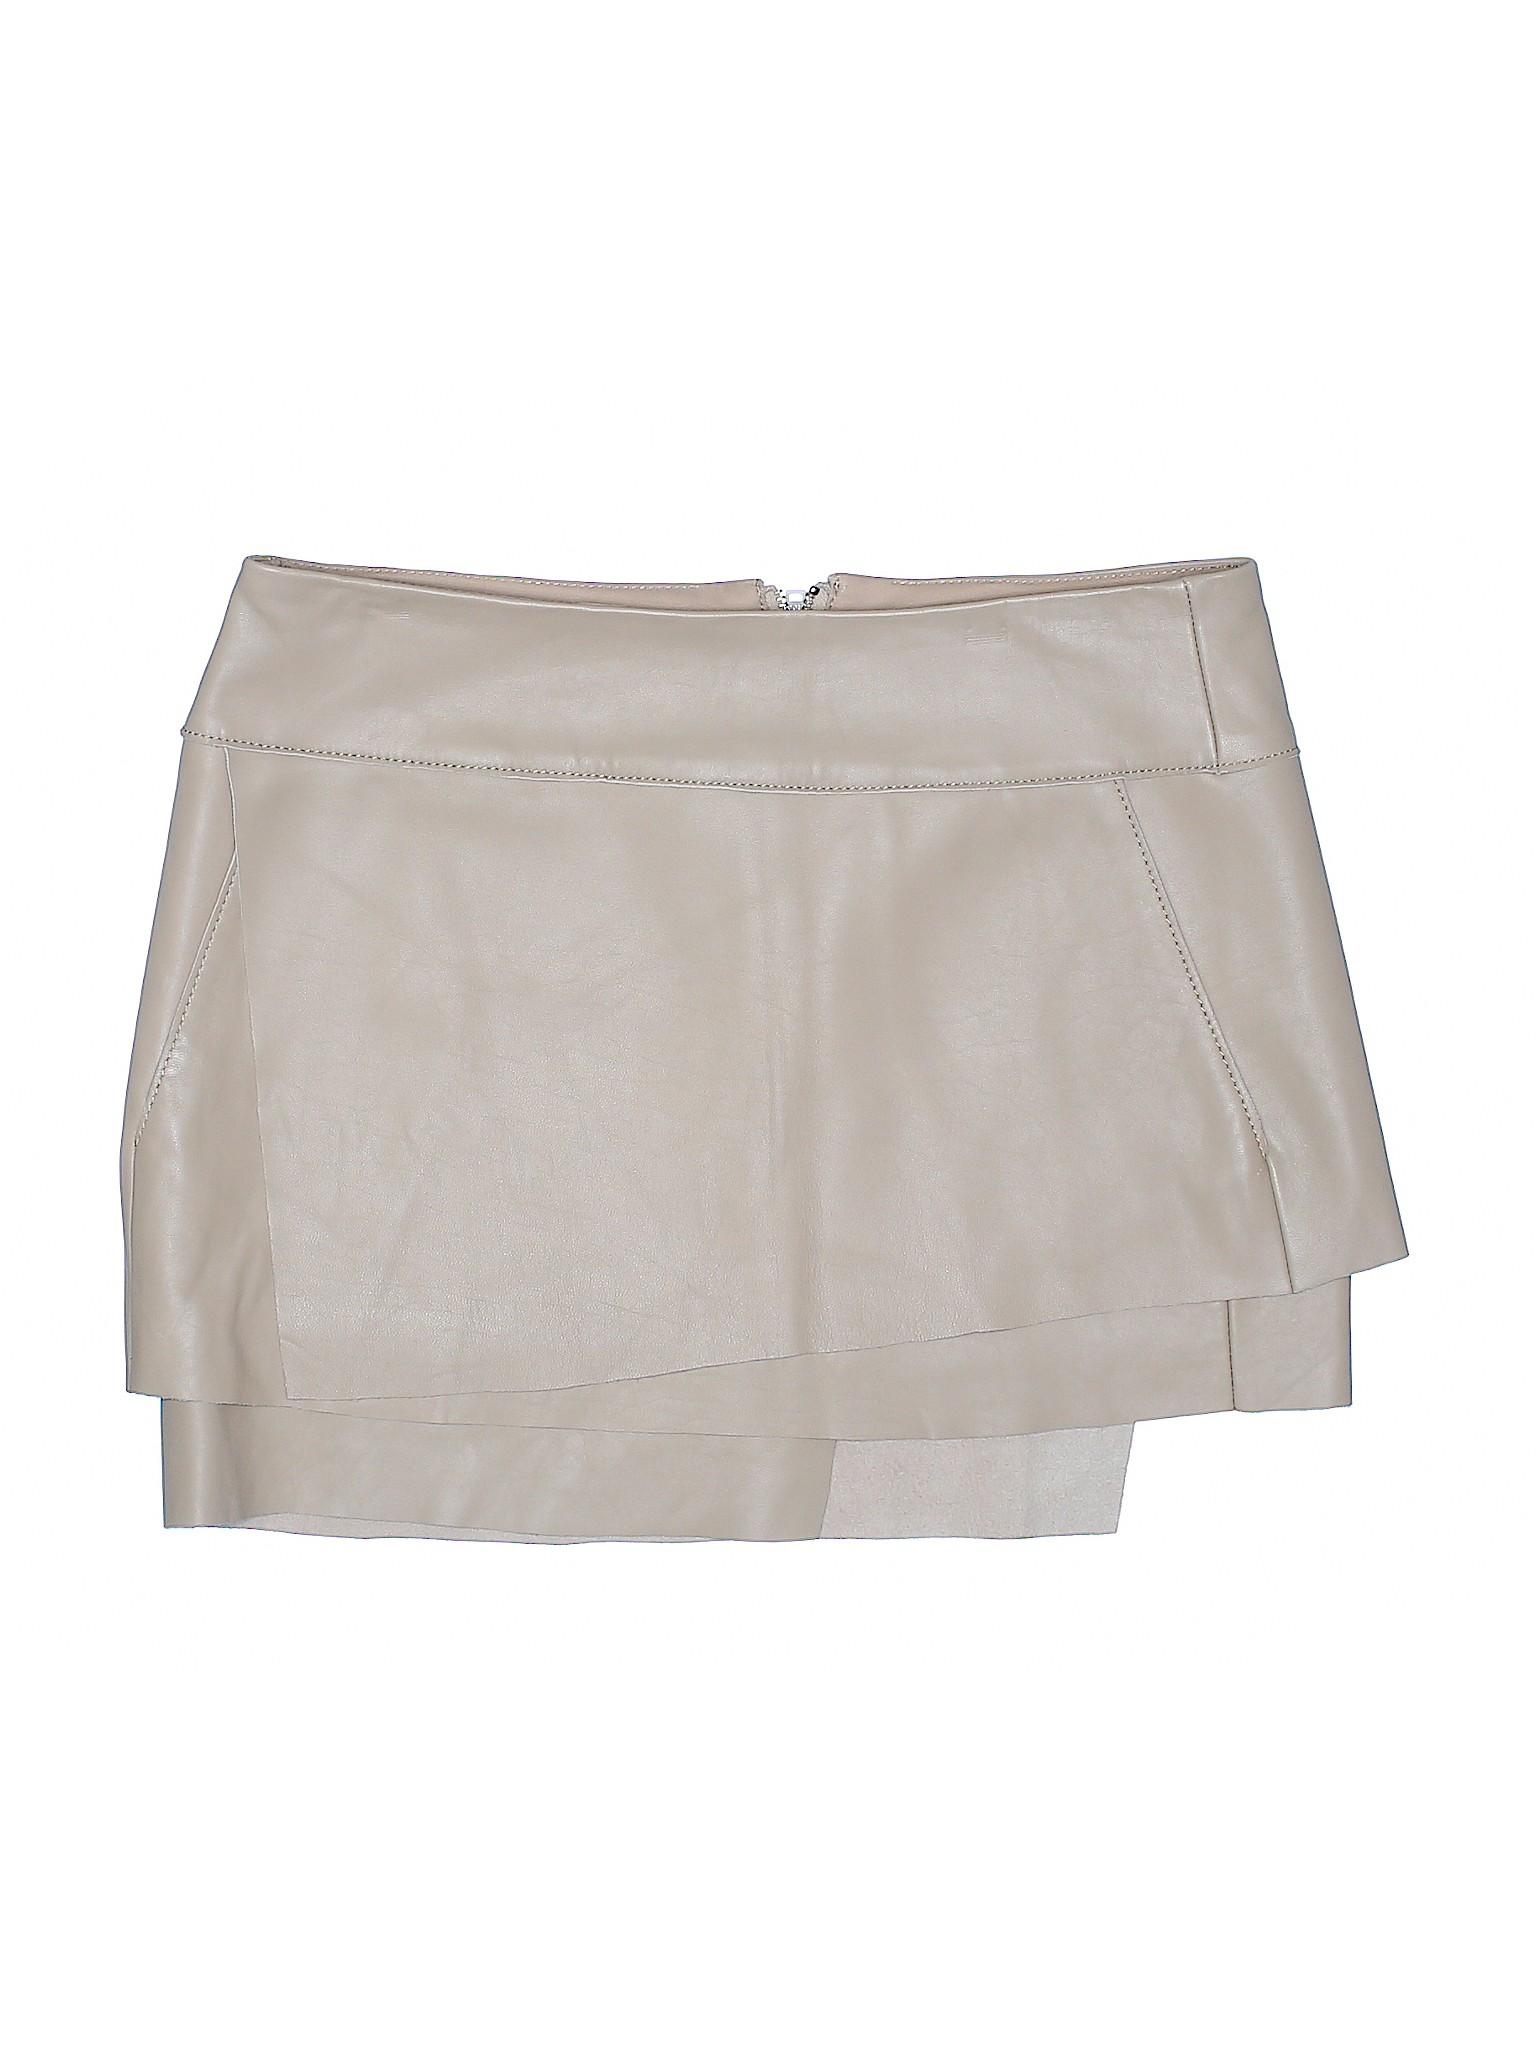 Skirt Leather Boutique leisure Helmut Lang ItUpqrUw7